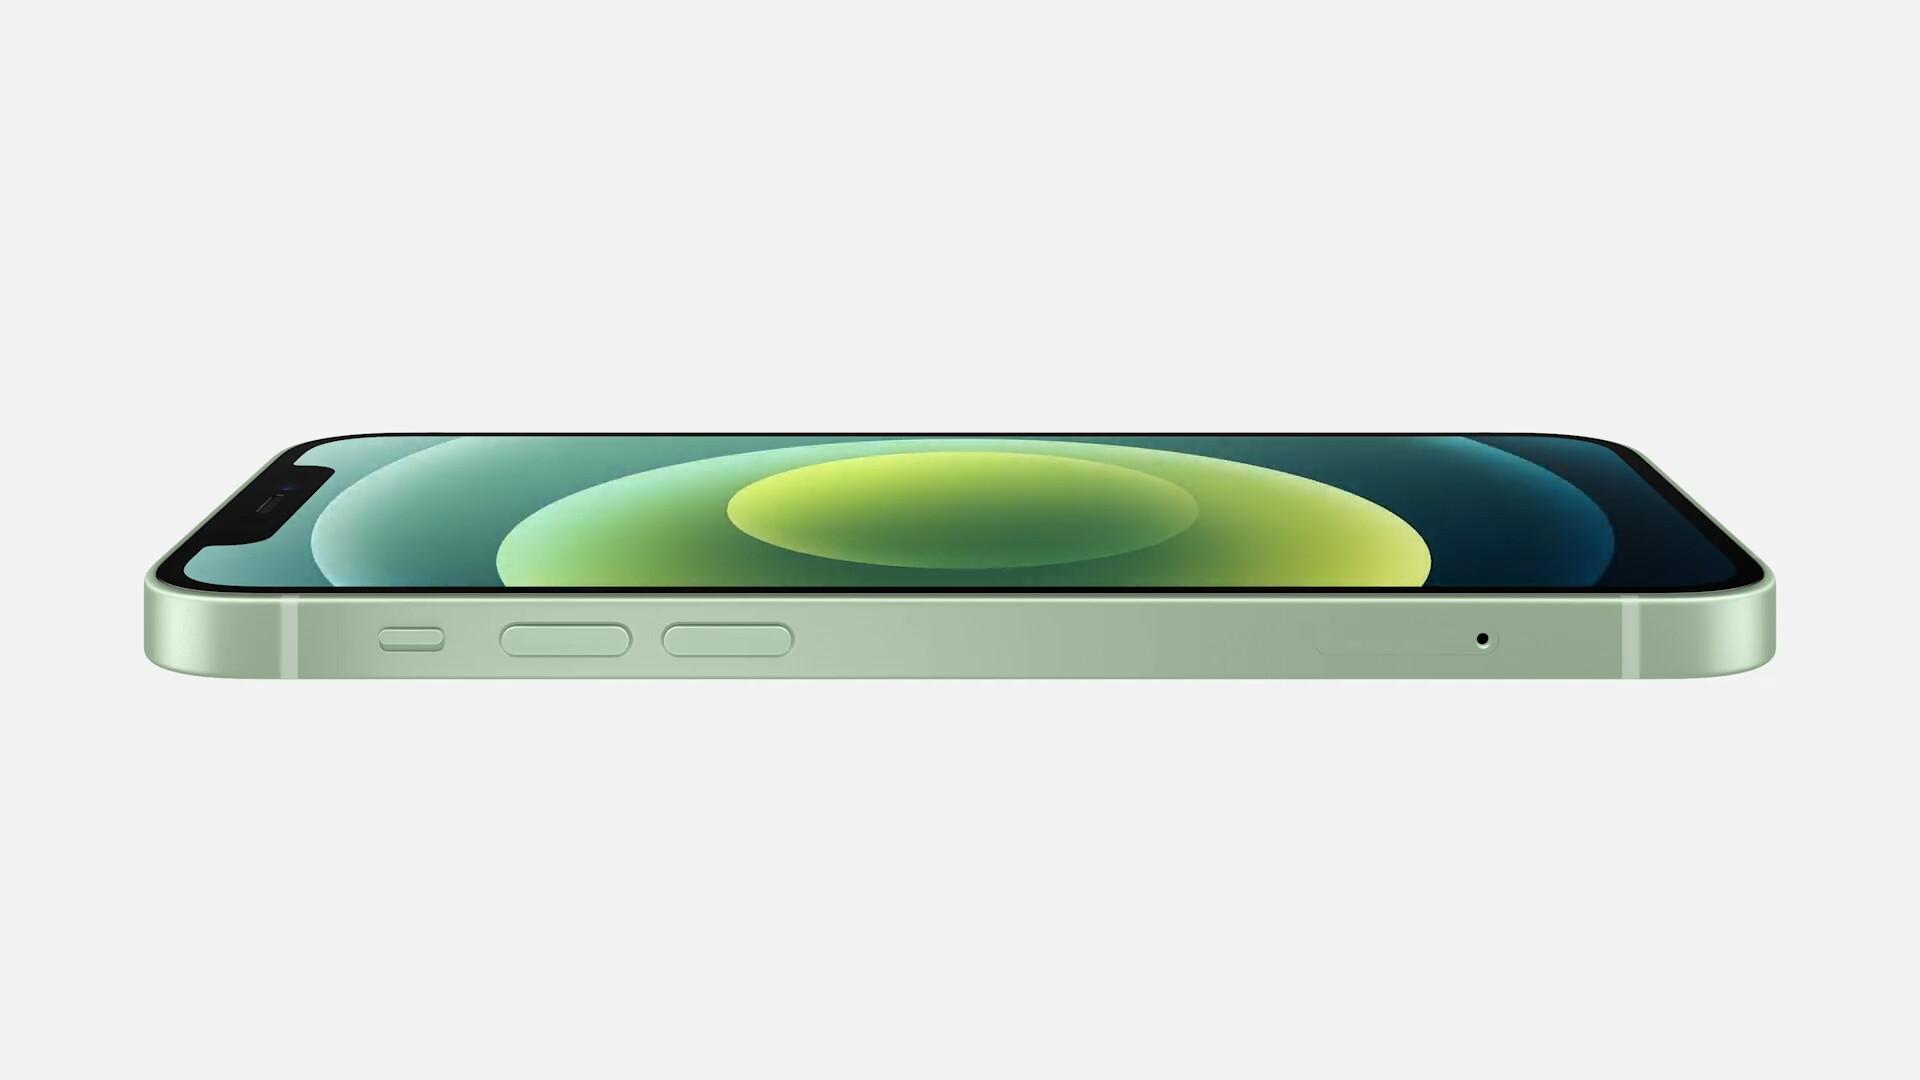 Apple iPhone 12 mini vs iPhone SE (2020)